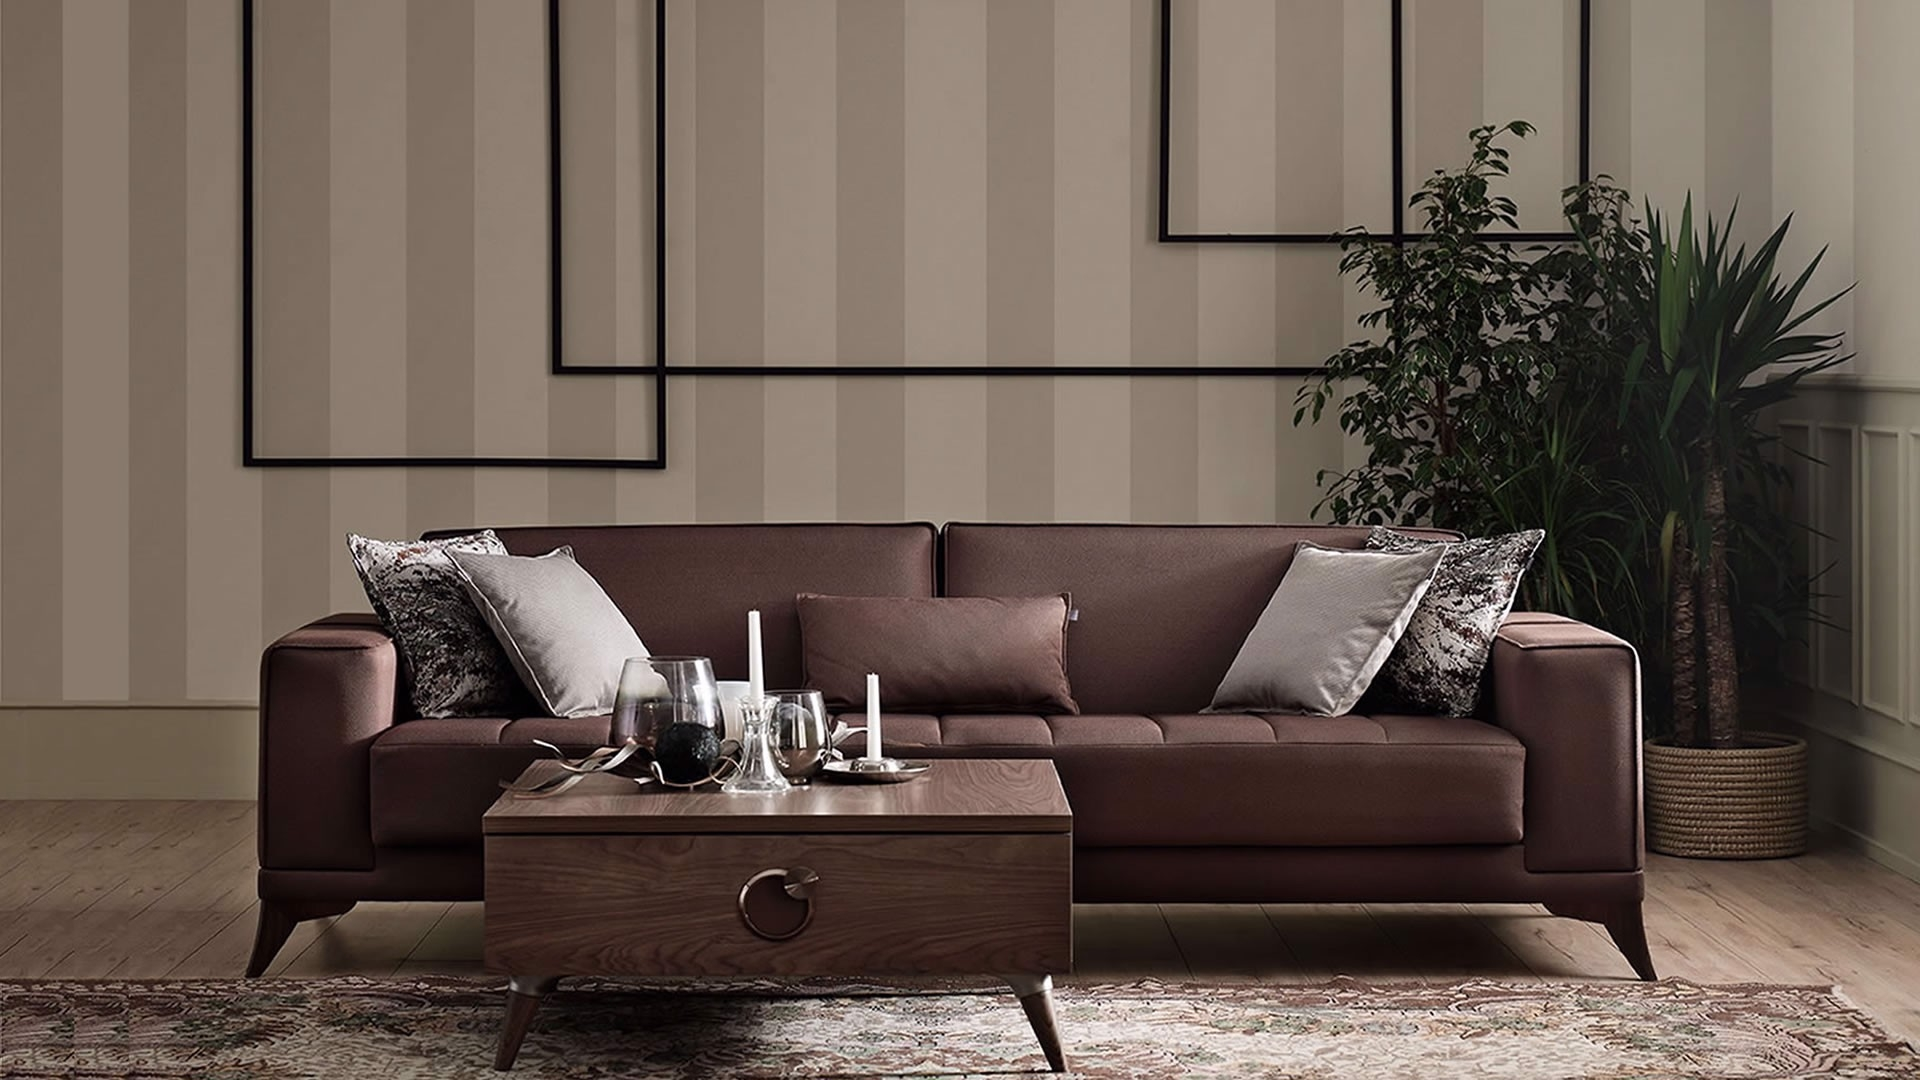 Canapea extensibila tapitata cu stofa, 3 locuri Maison Maro, l234xA85xH80 cm